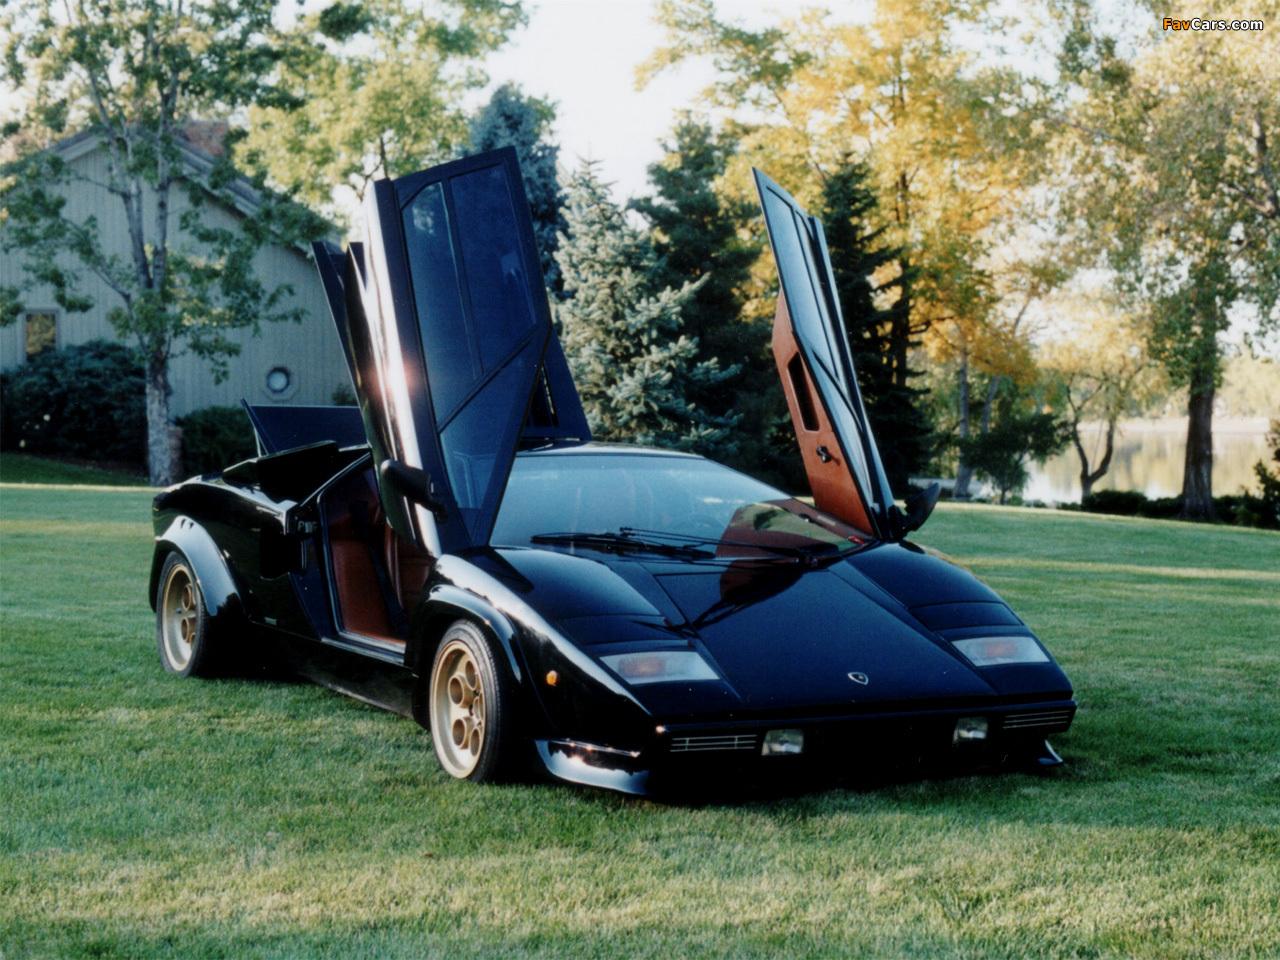 Lamborghini Countach Wallpapers 1280x960